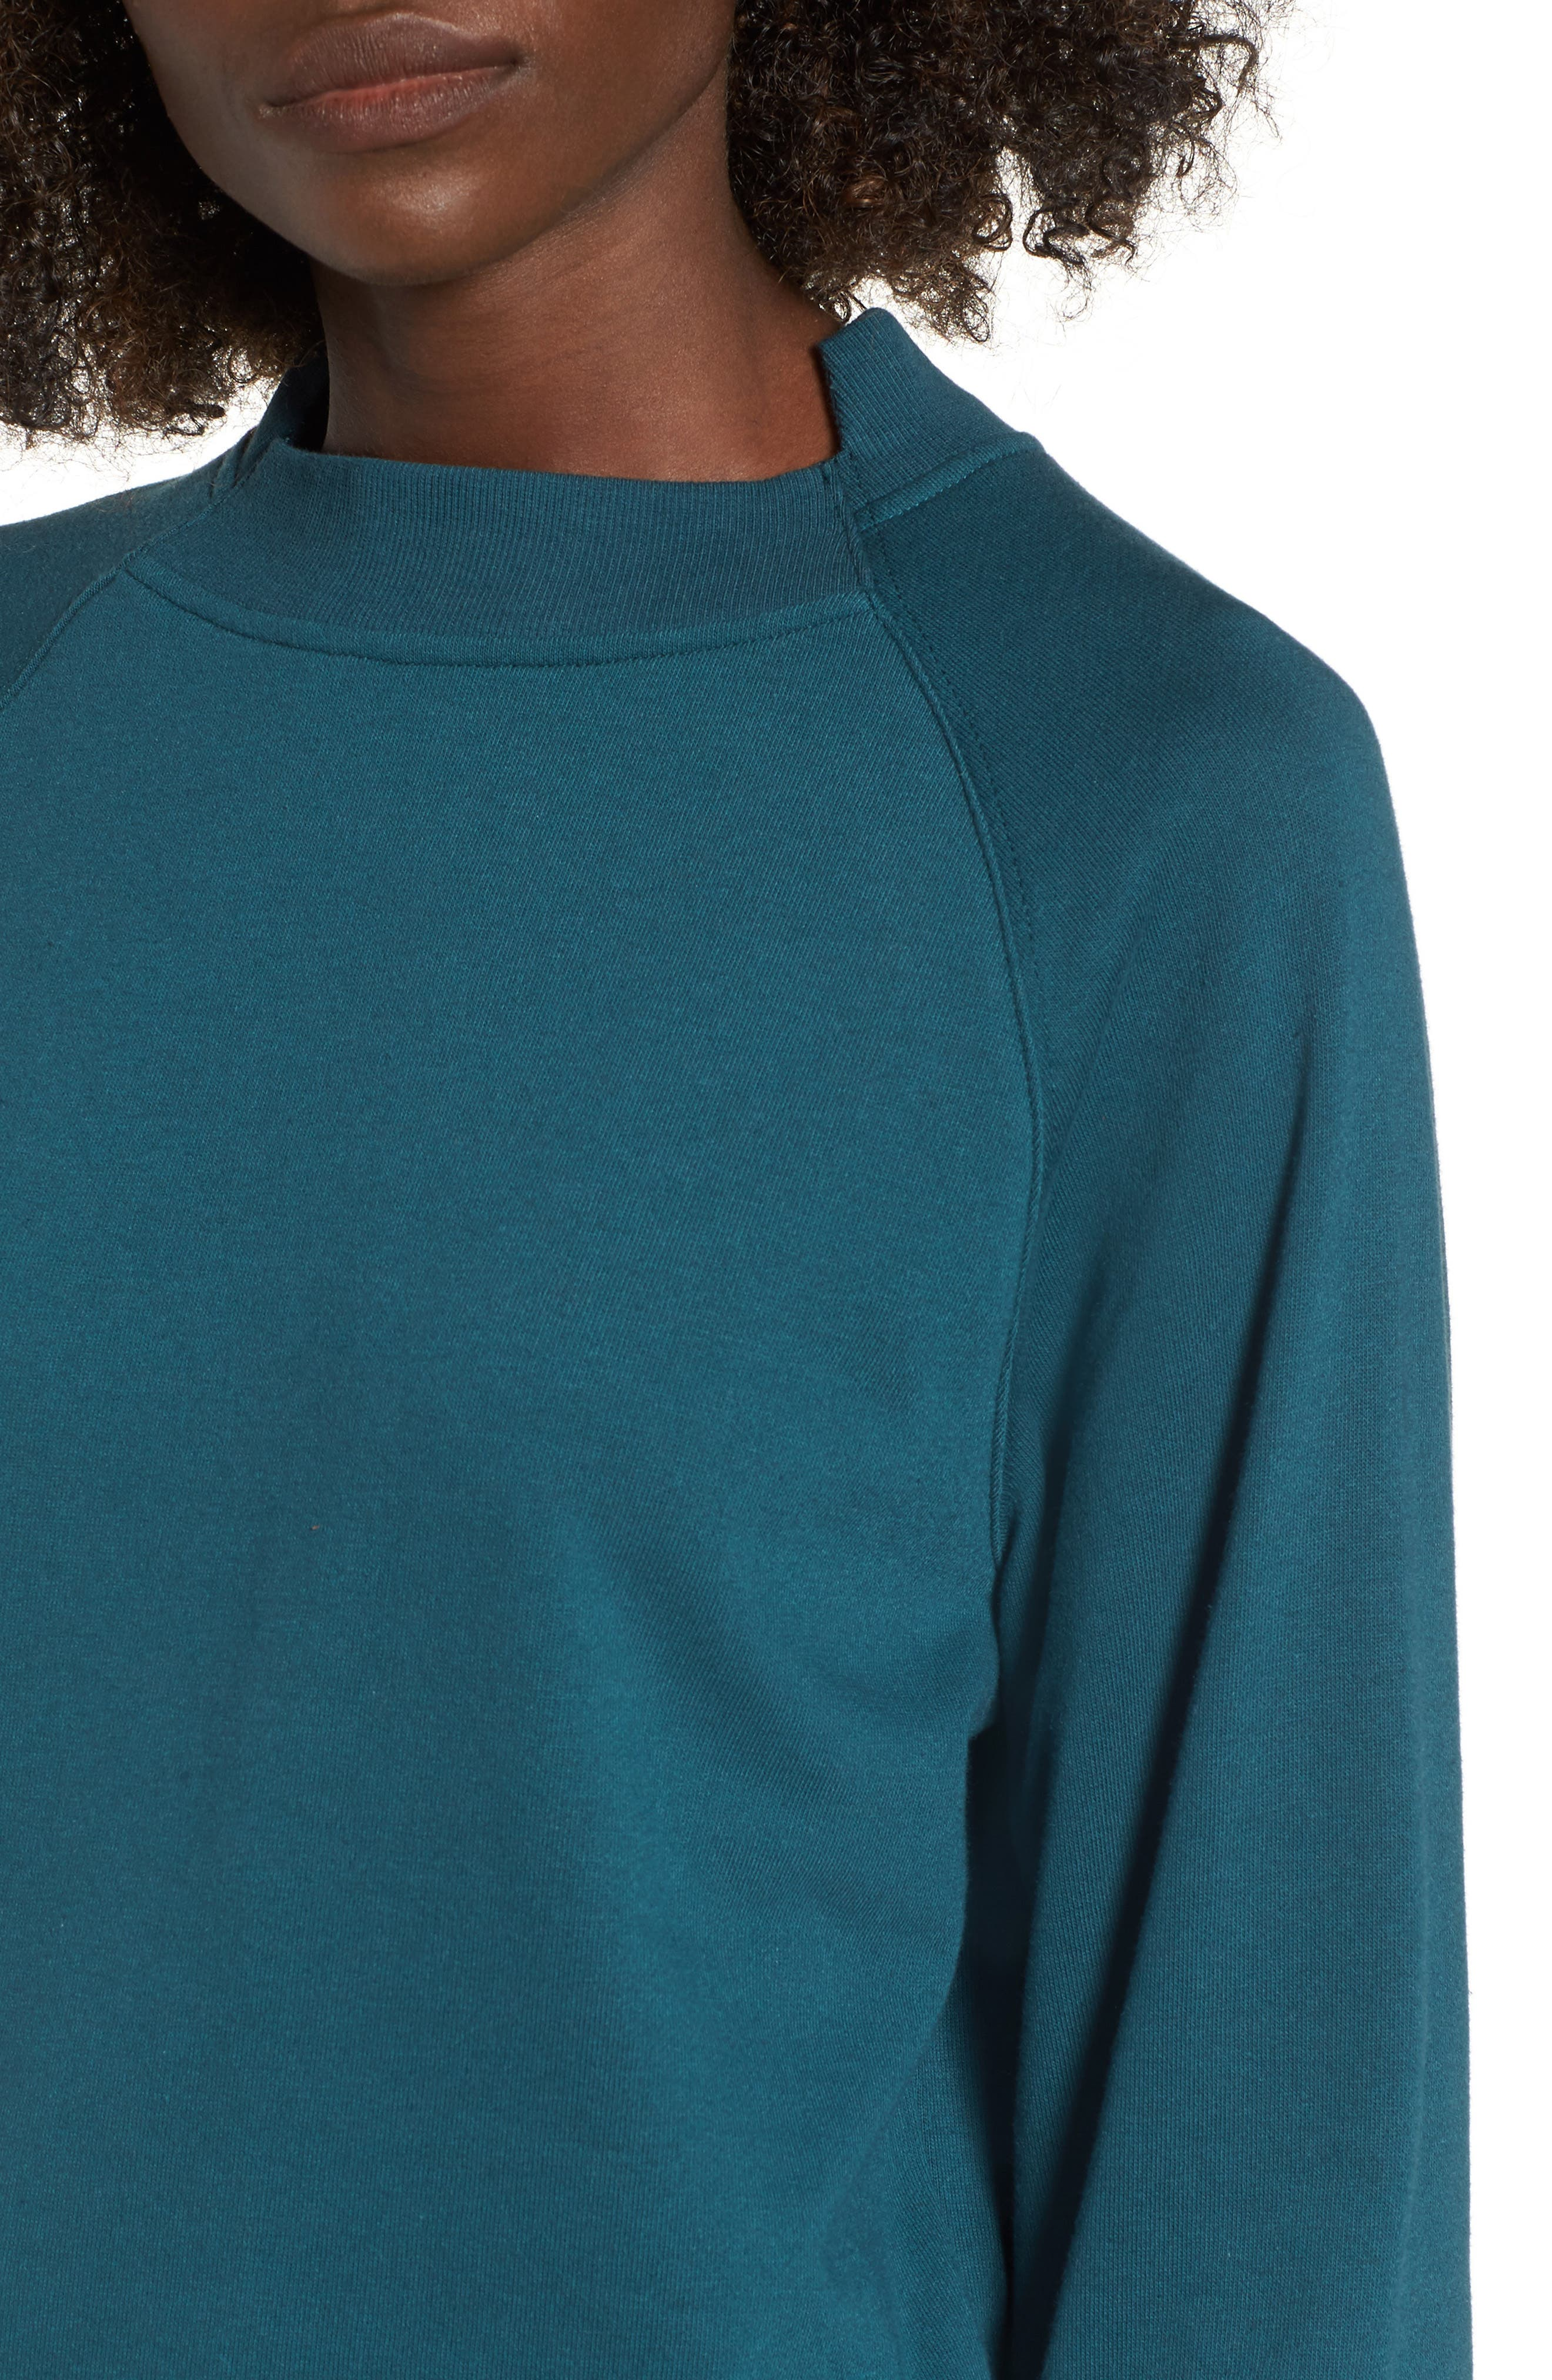 Cinched Sleeve Sweatshirt,                             Alternate thumbnail 4, color,                             440